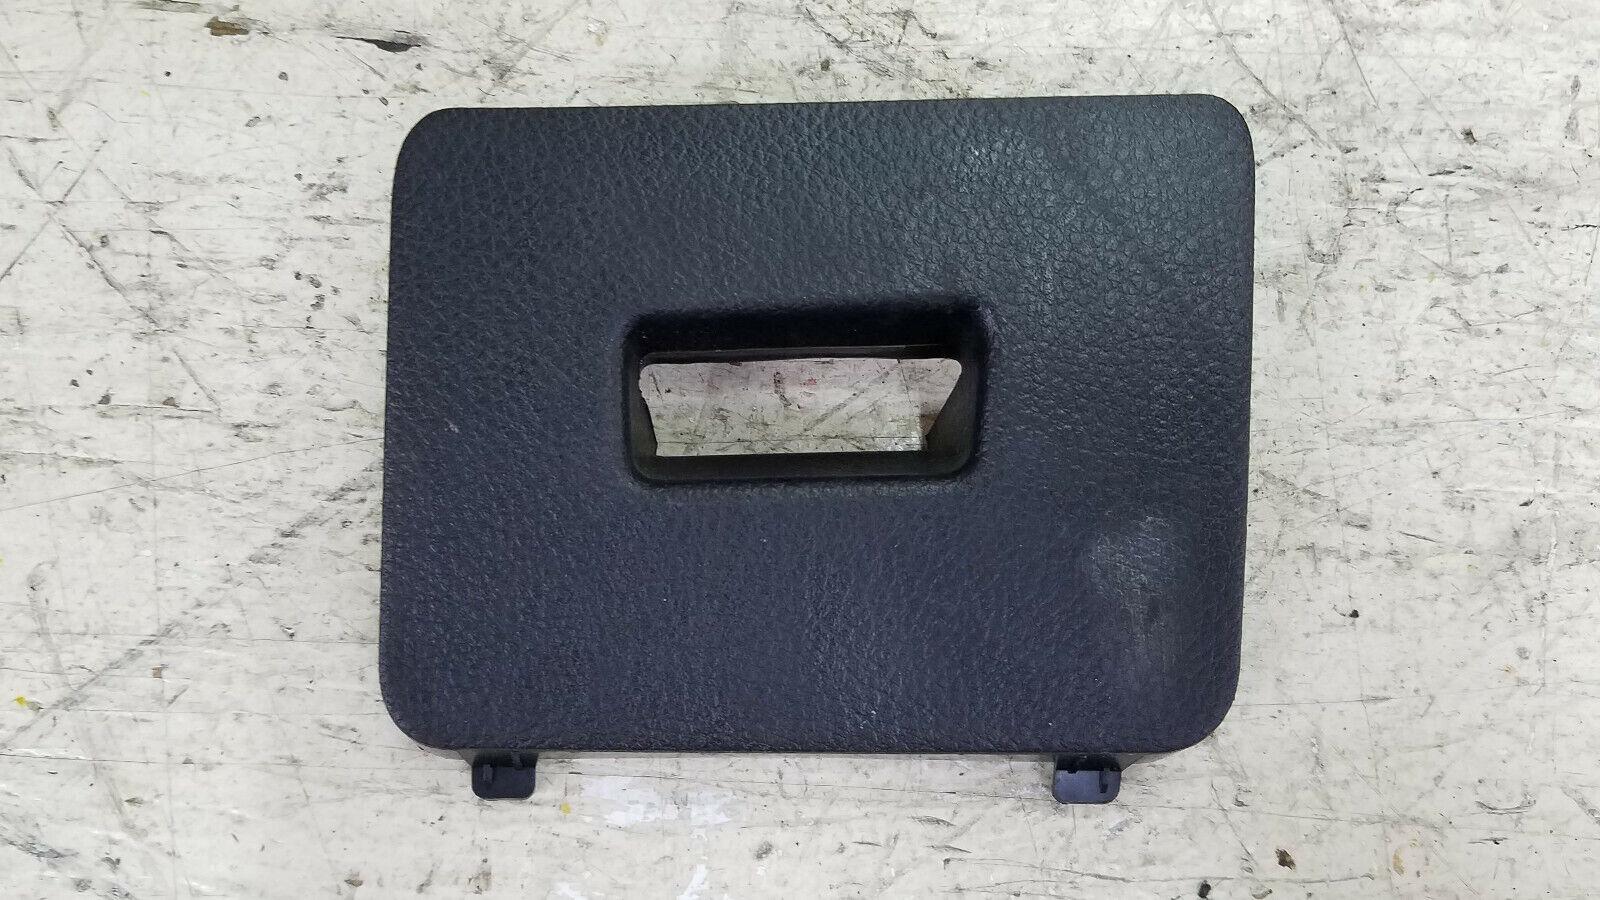 2012 nissan altima interior fuse box panel cover lid under dash oem